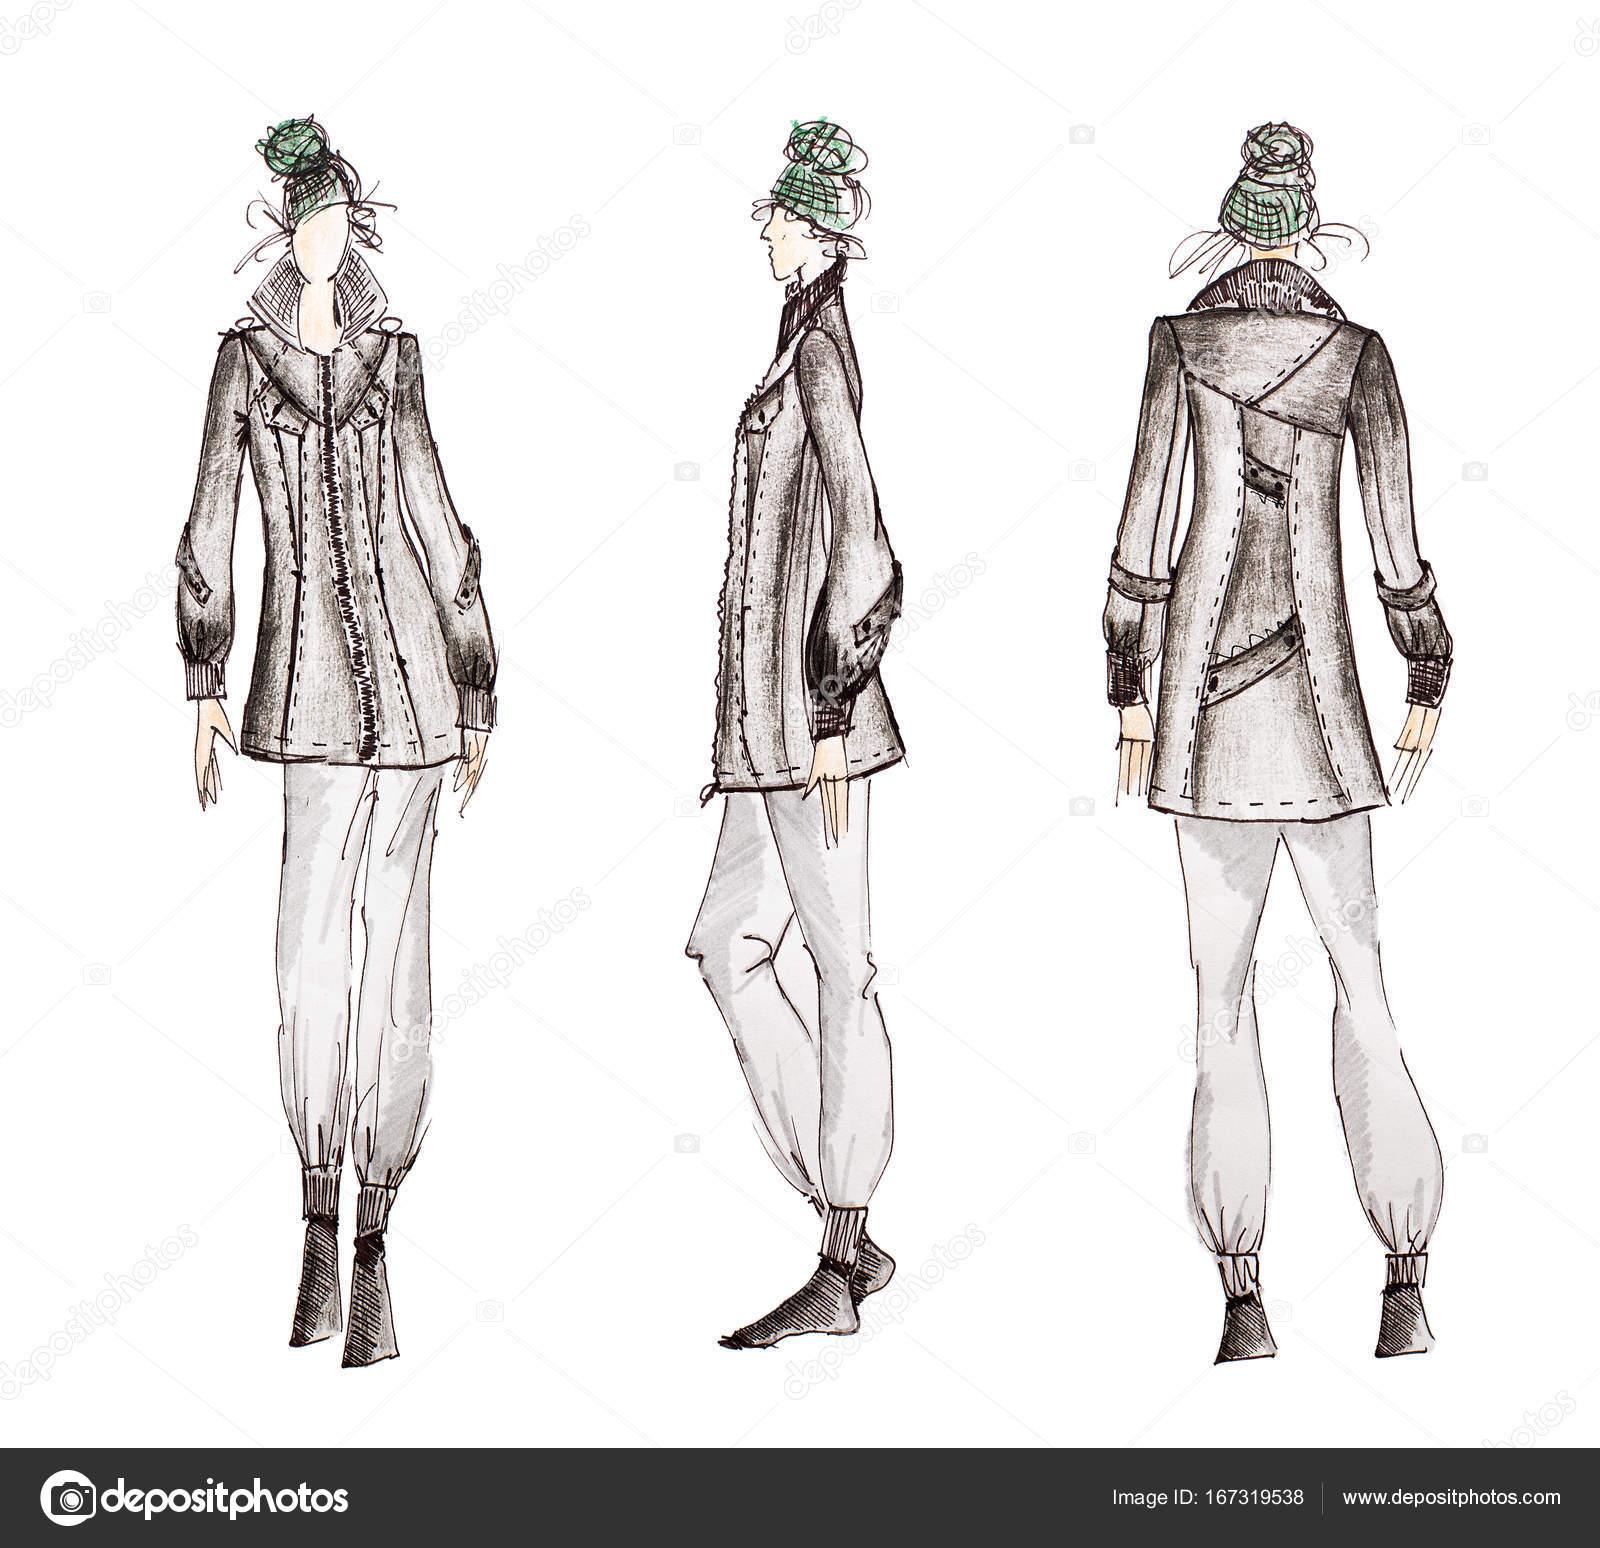 designer sketches